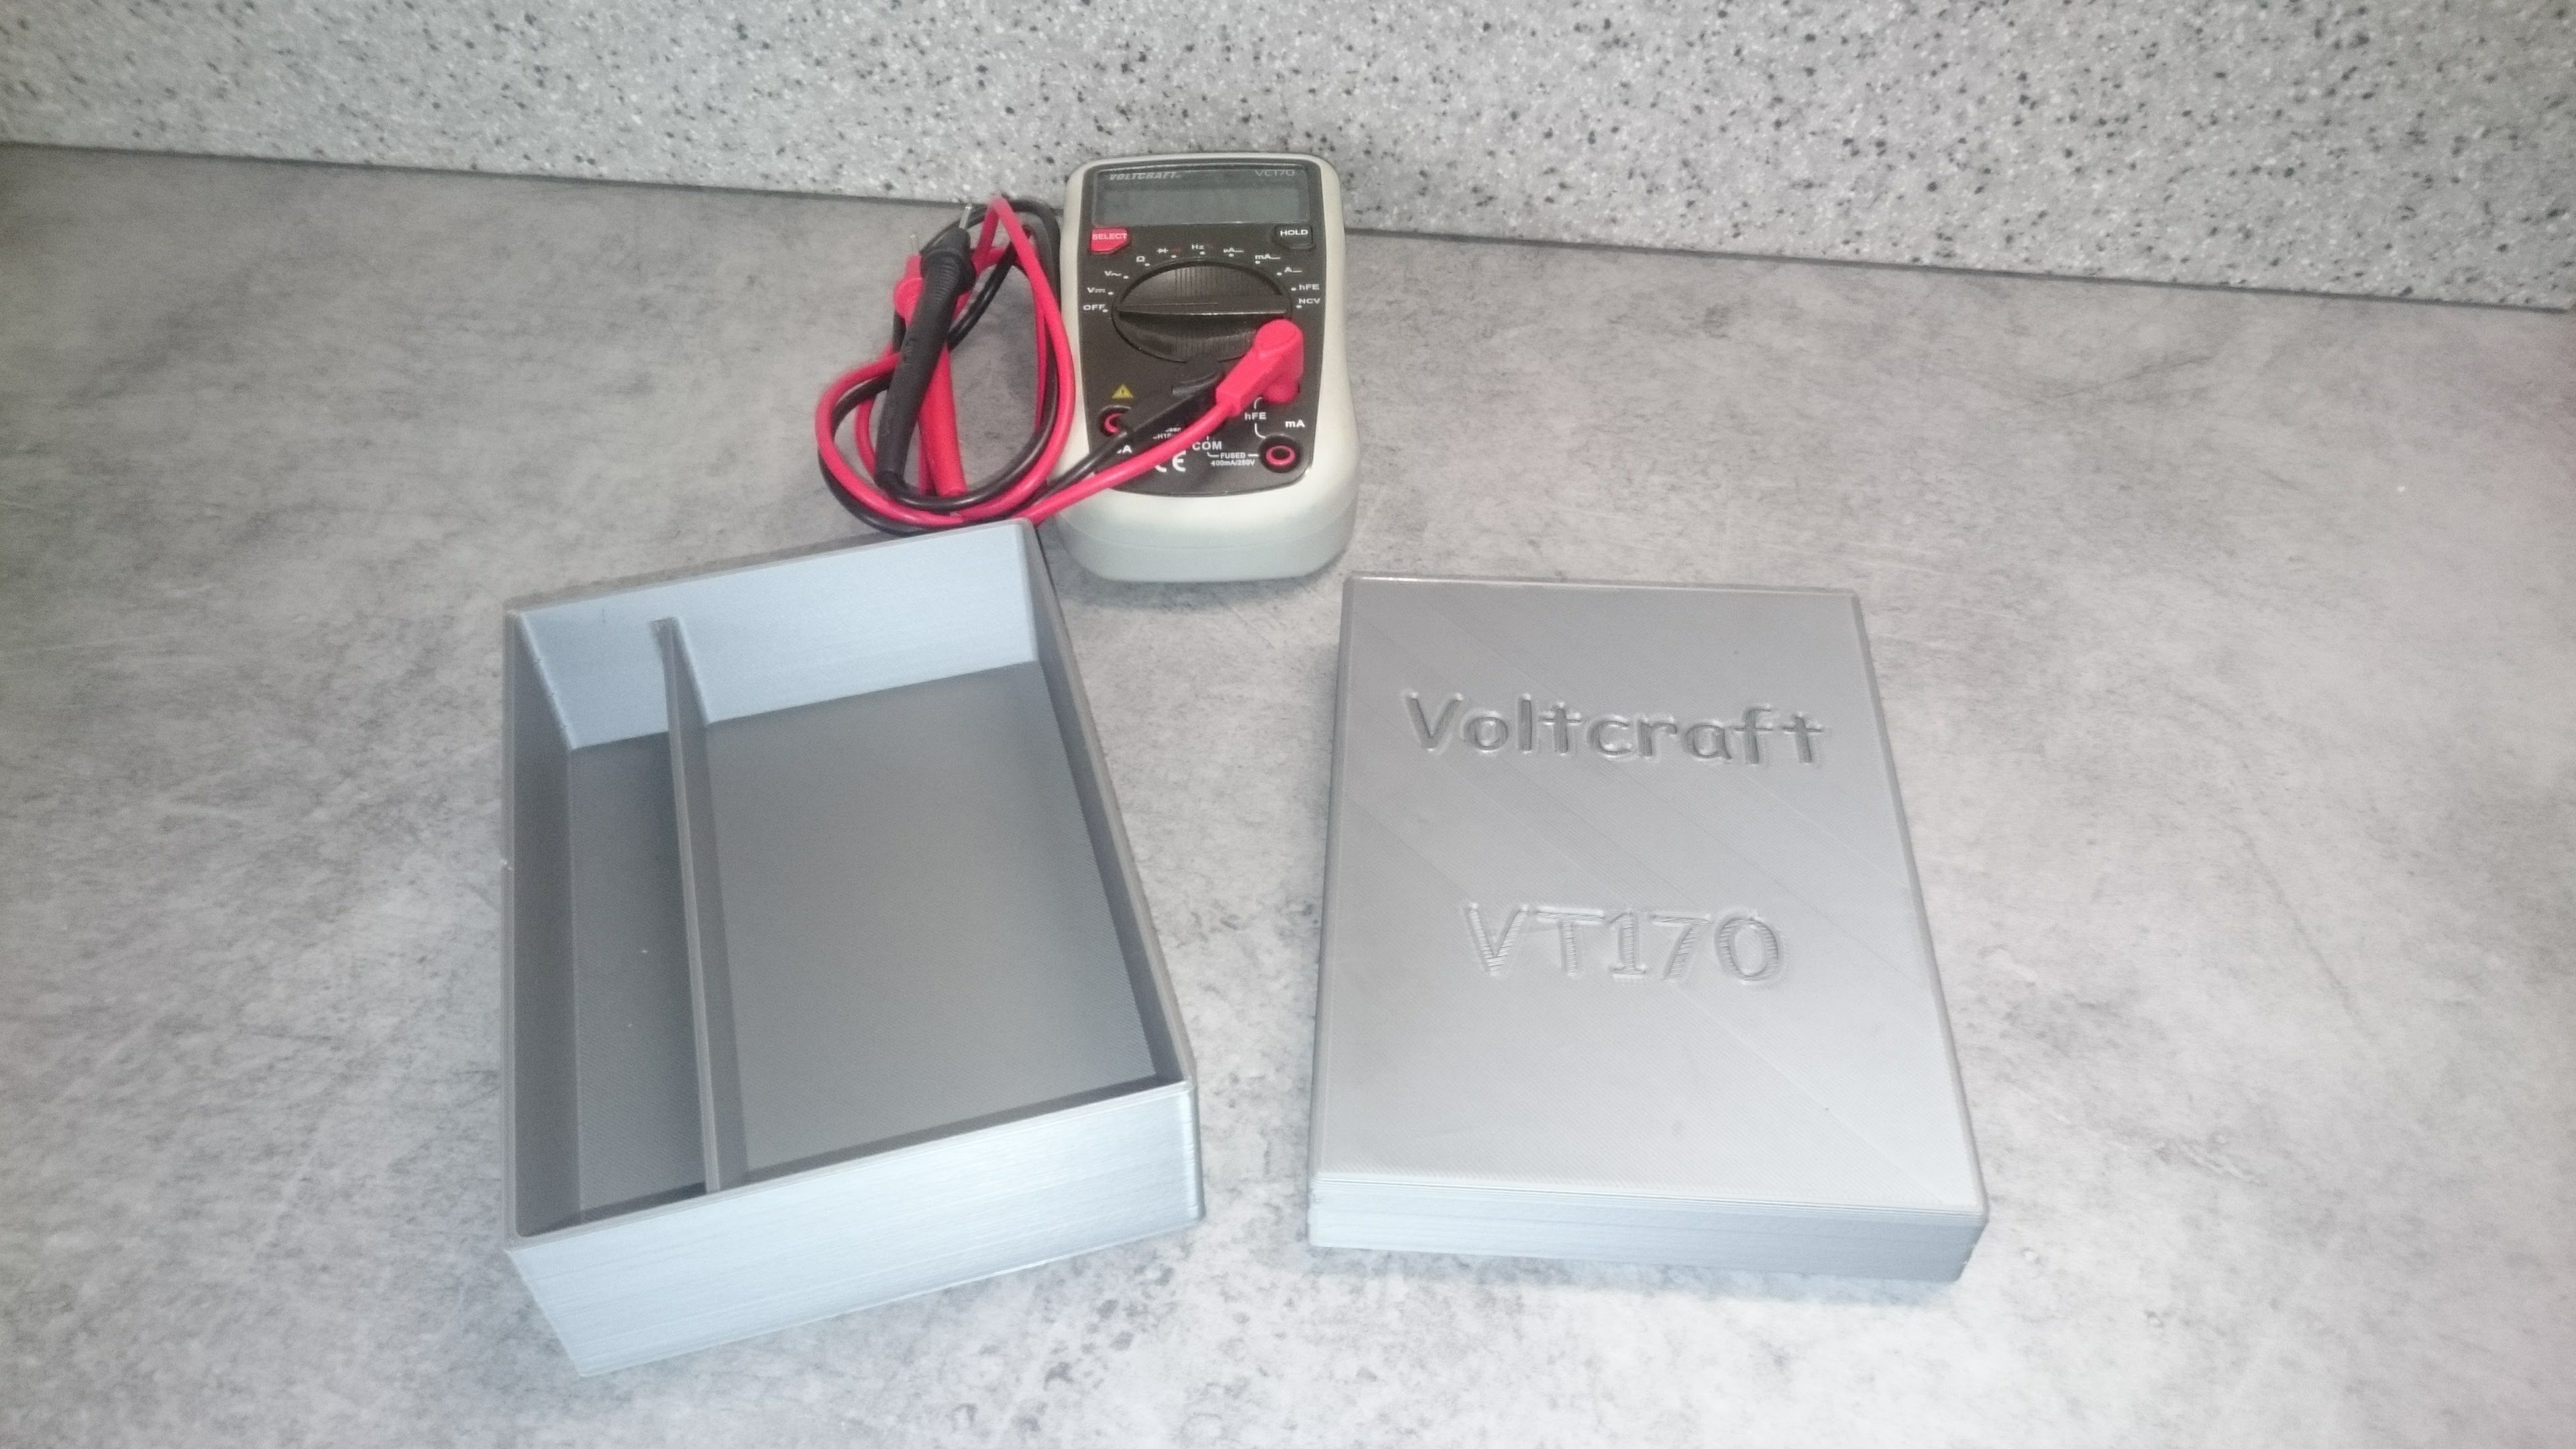 Voltcraft VC170 01.jpg Download free STL file Box for Voltmeter • 3D print template, Ldom21